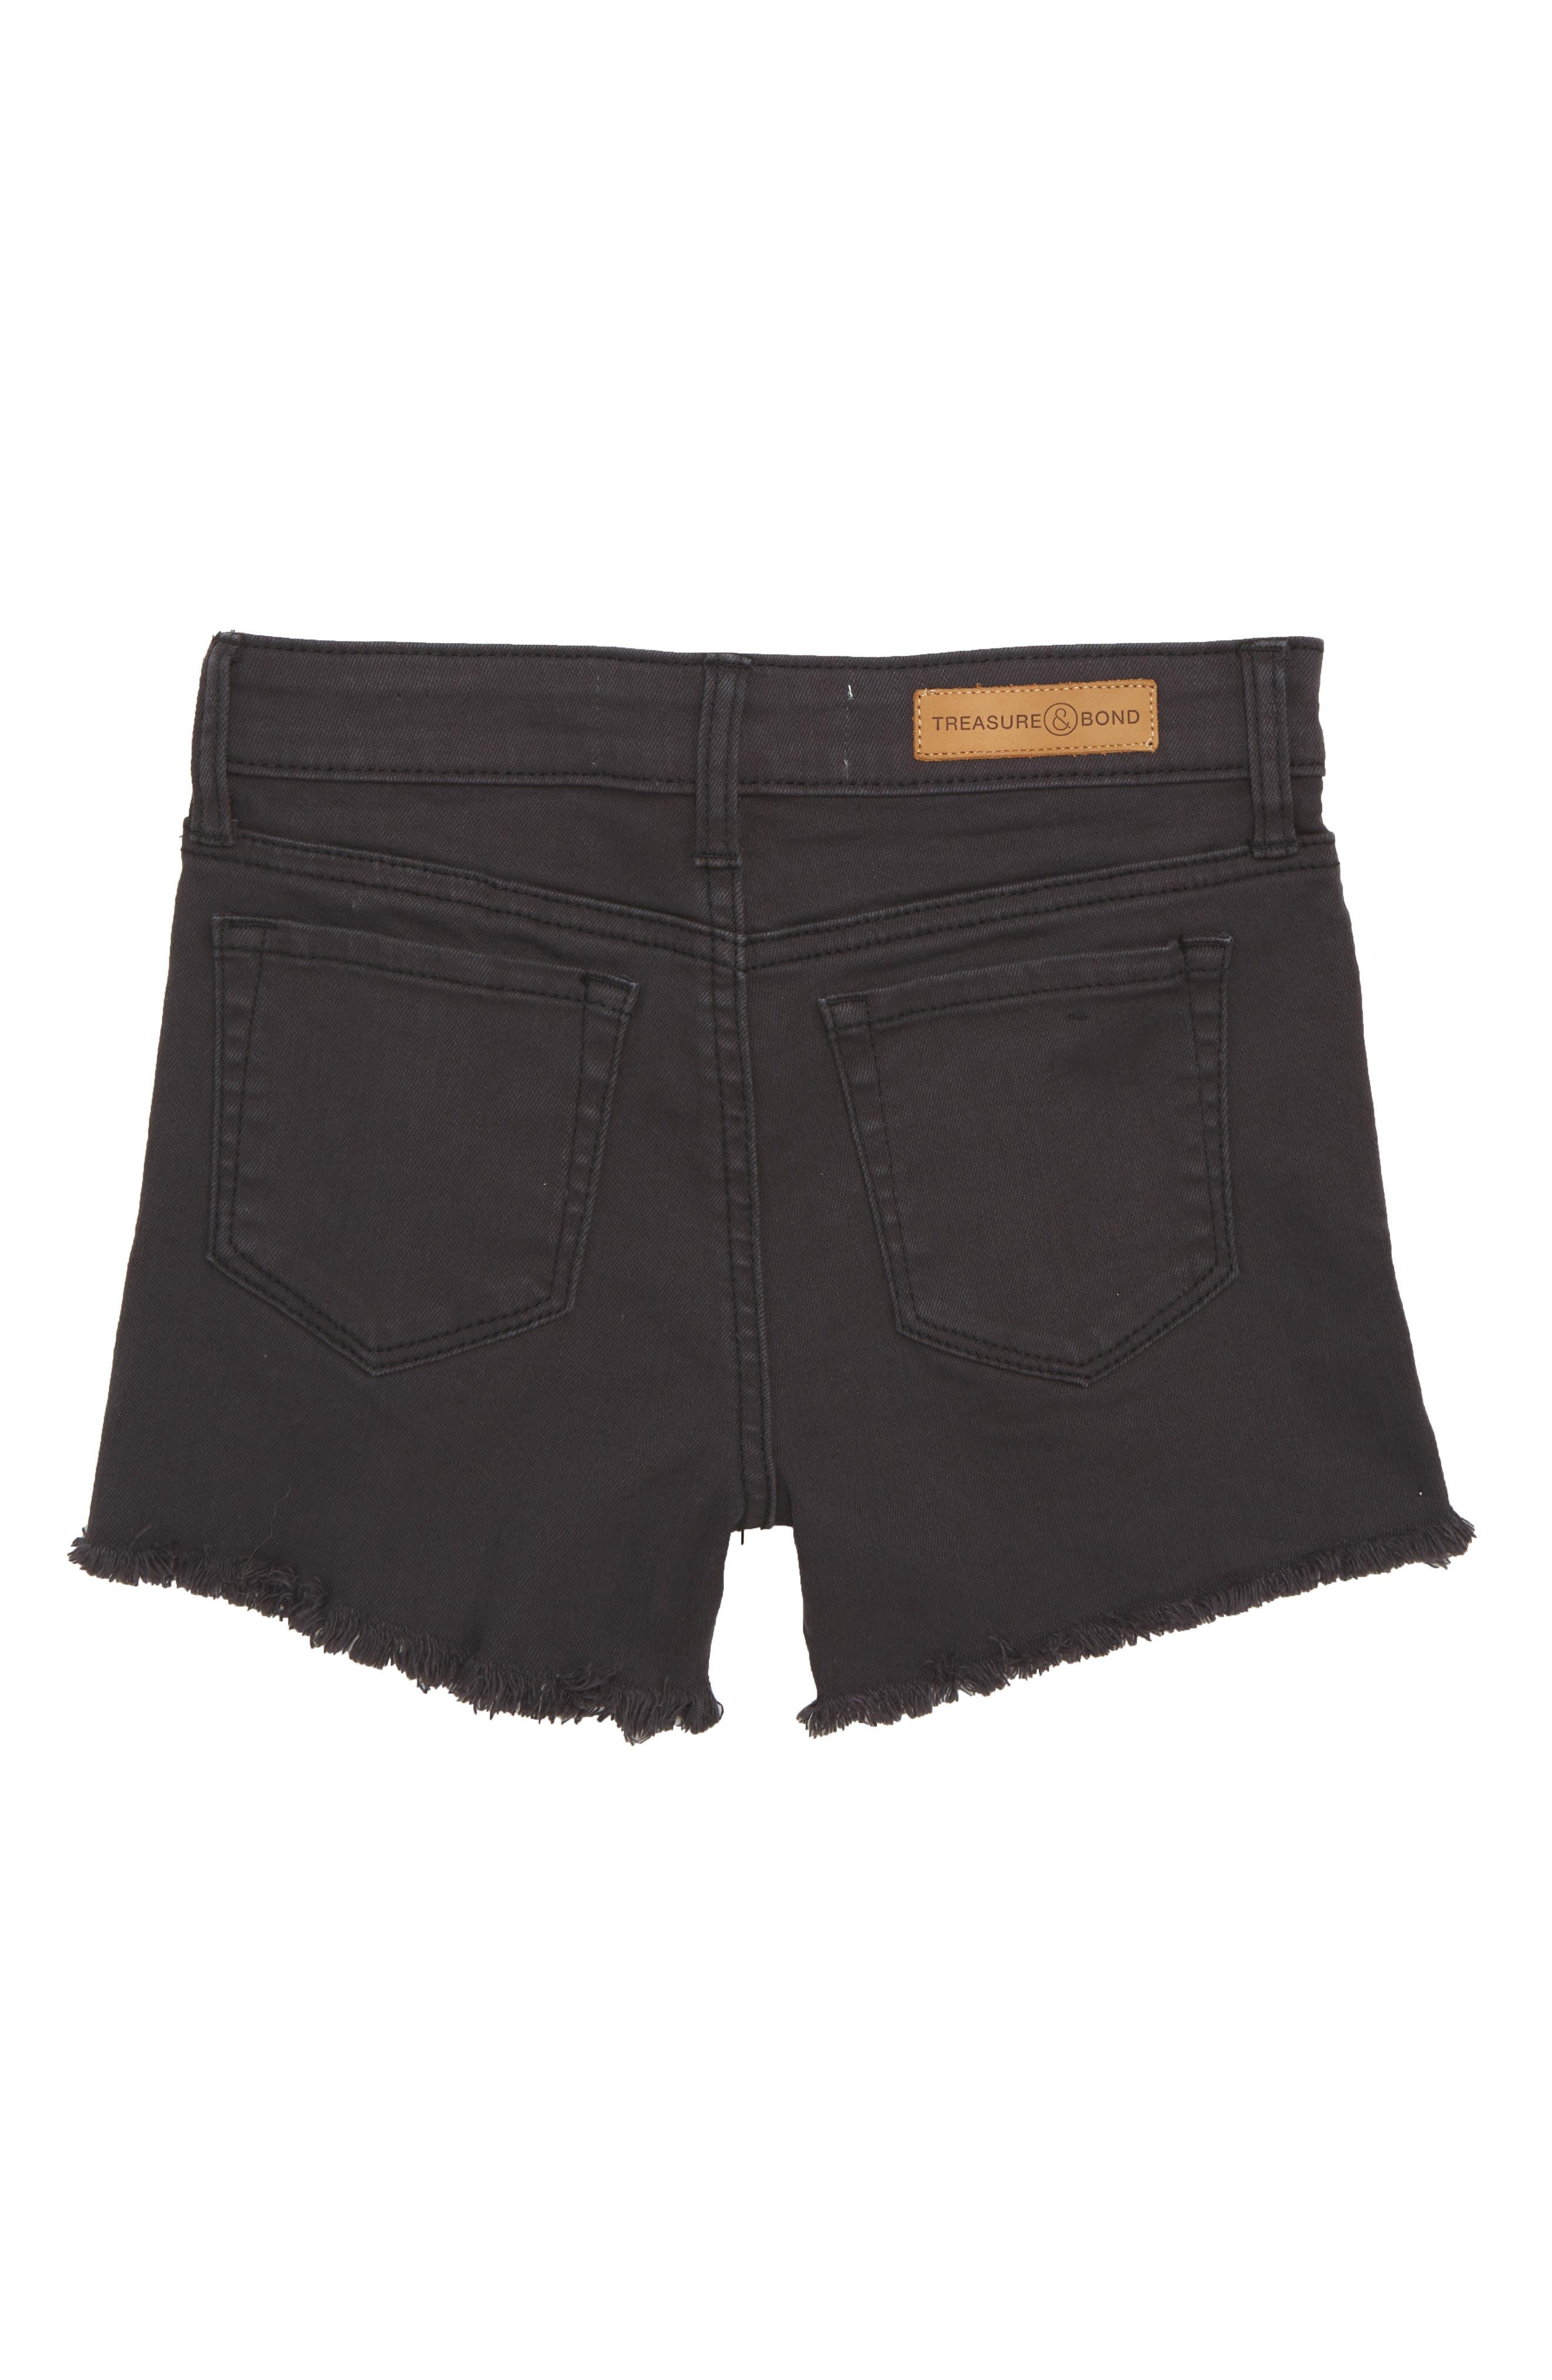 Distressed Cutoff Denim Shorts,                             Alternate thumbnail 2, color,                             BLACK